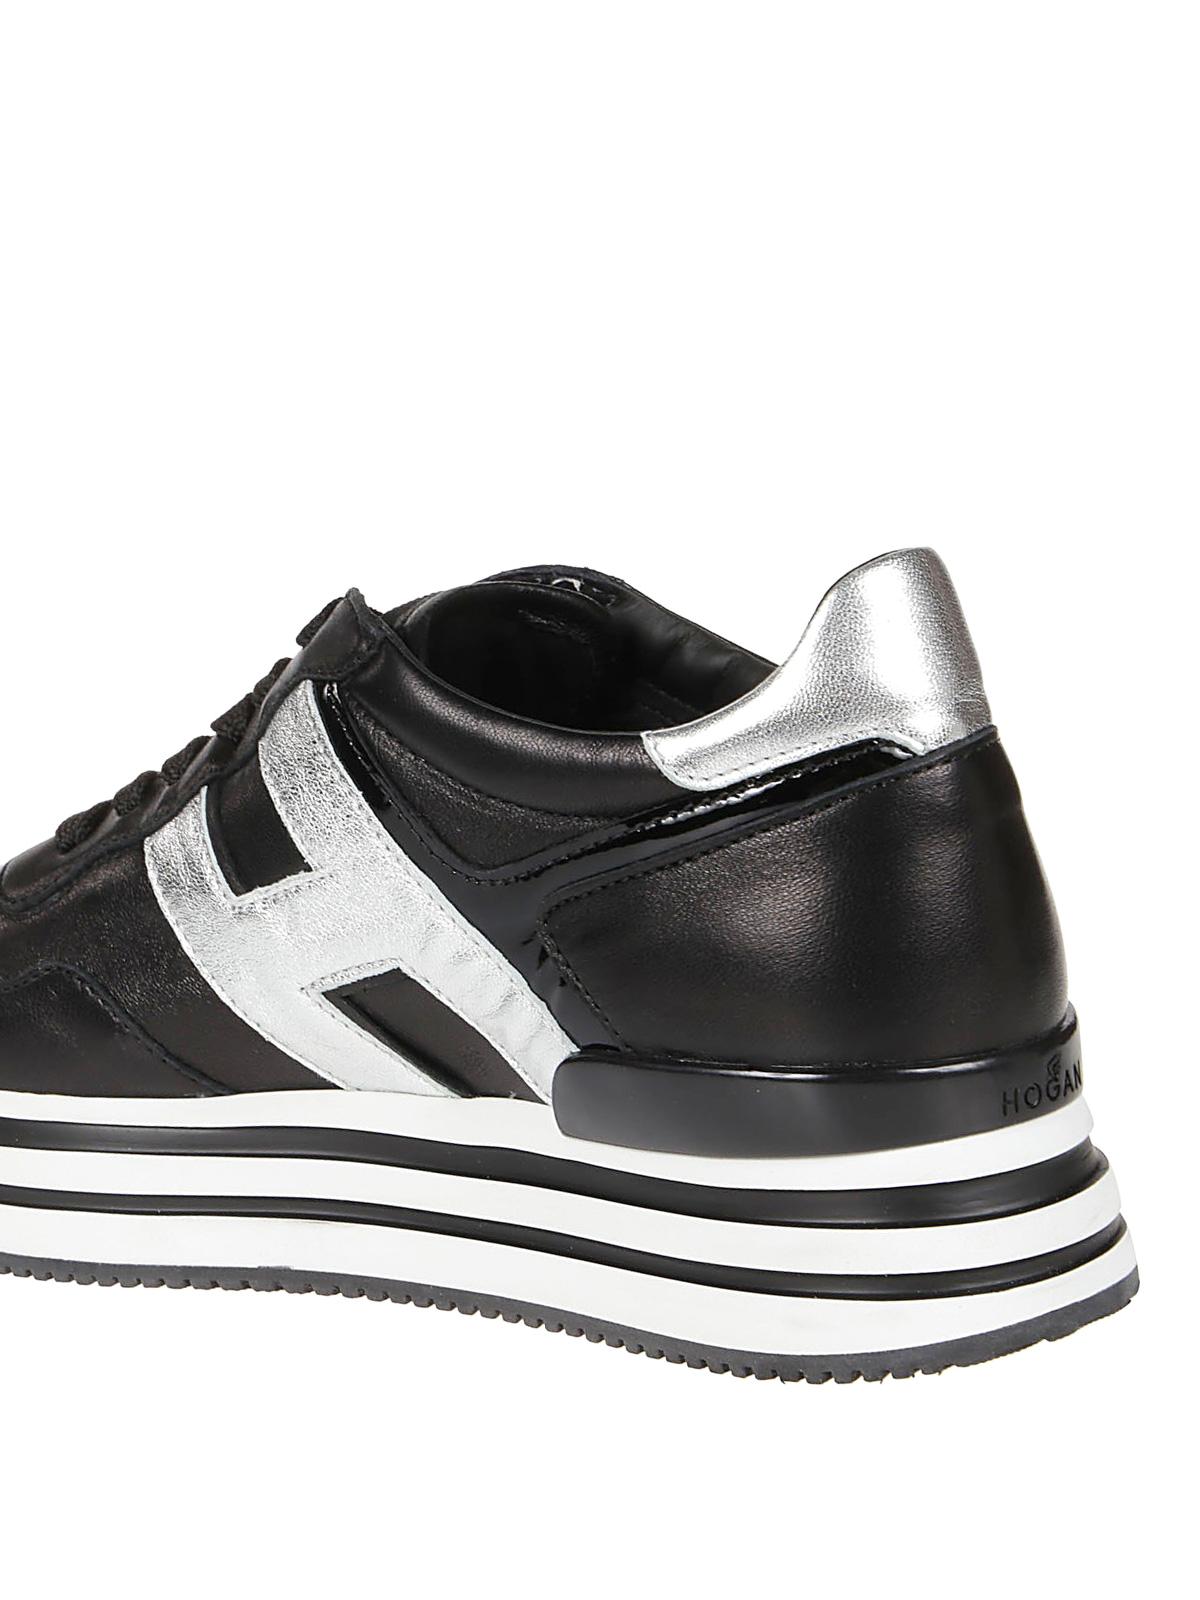 Hogan - Maxi H222 black sneakers - trainers - HXW4830CB80M5B0353